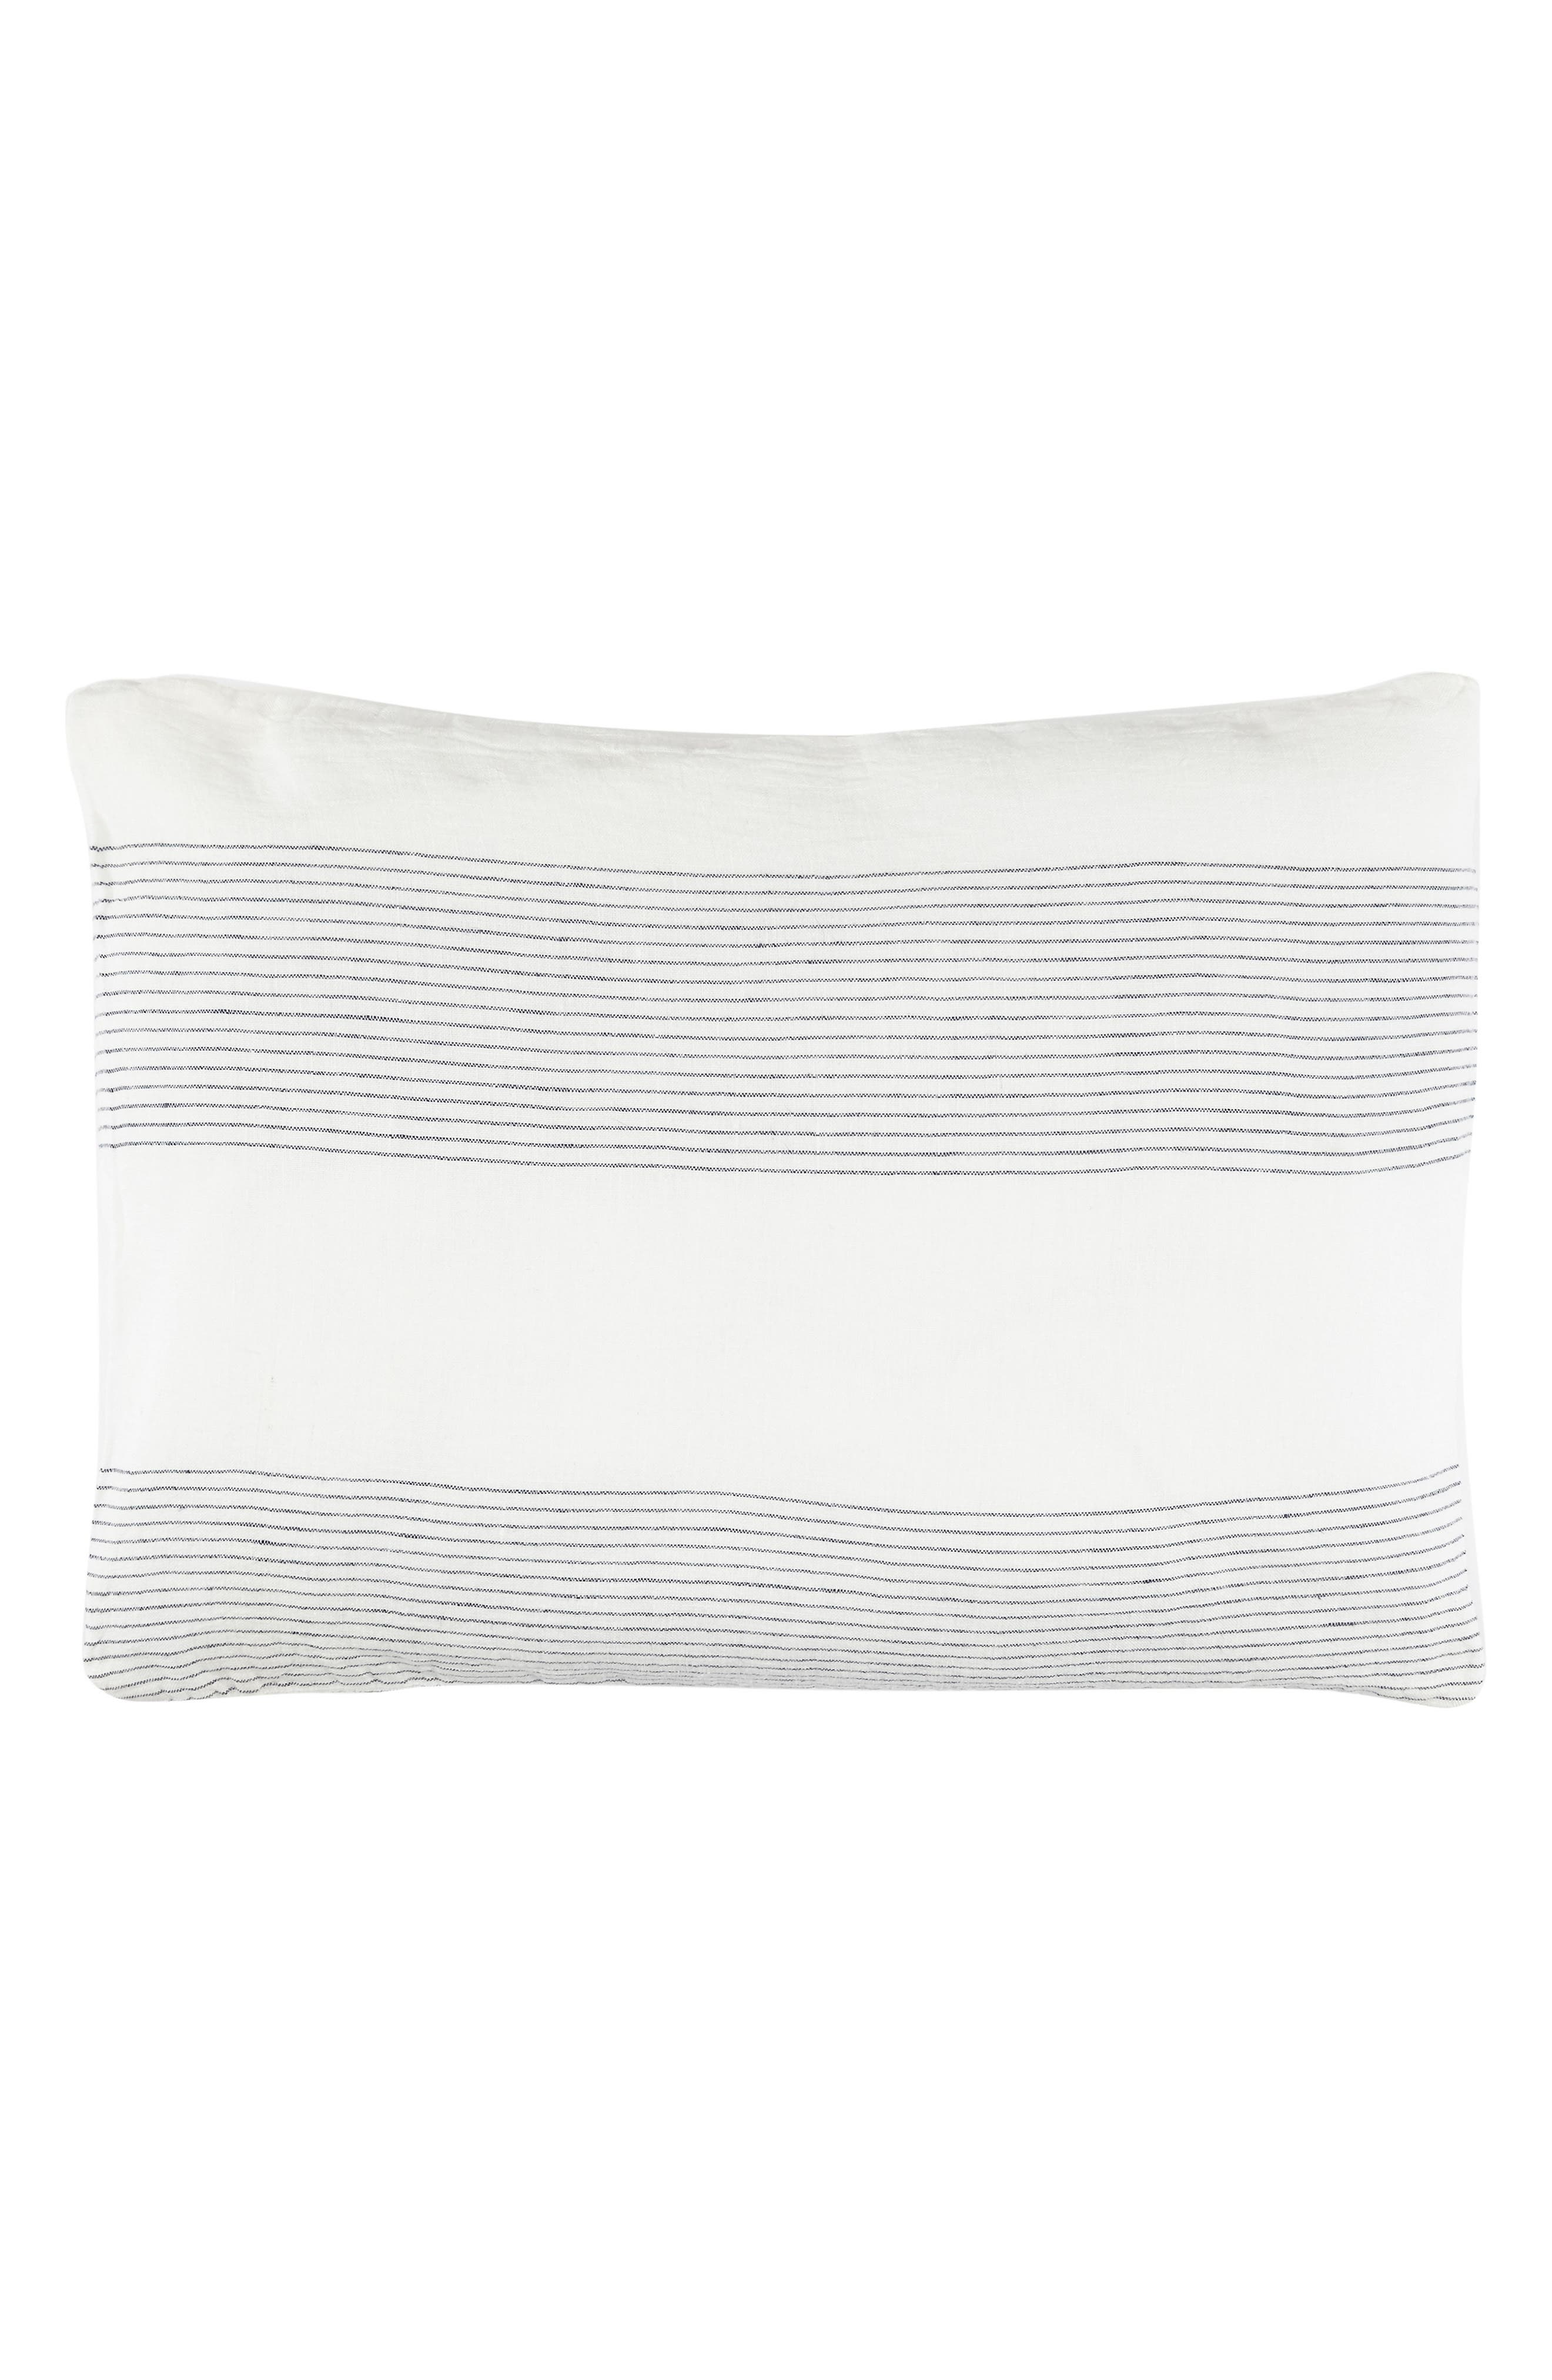 Amagansett Linen Accent Pillow,                         Main,                         color, White/ Indigo